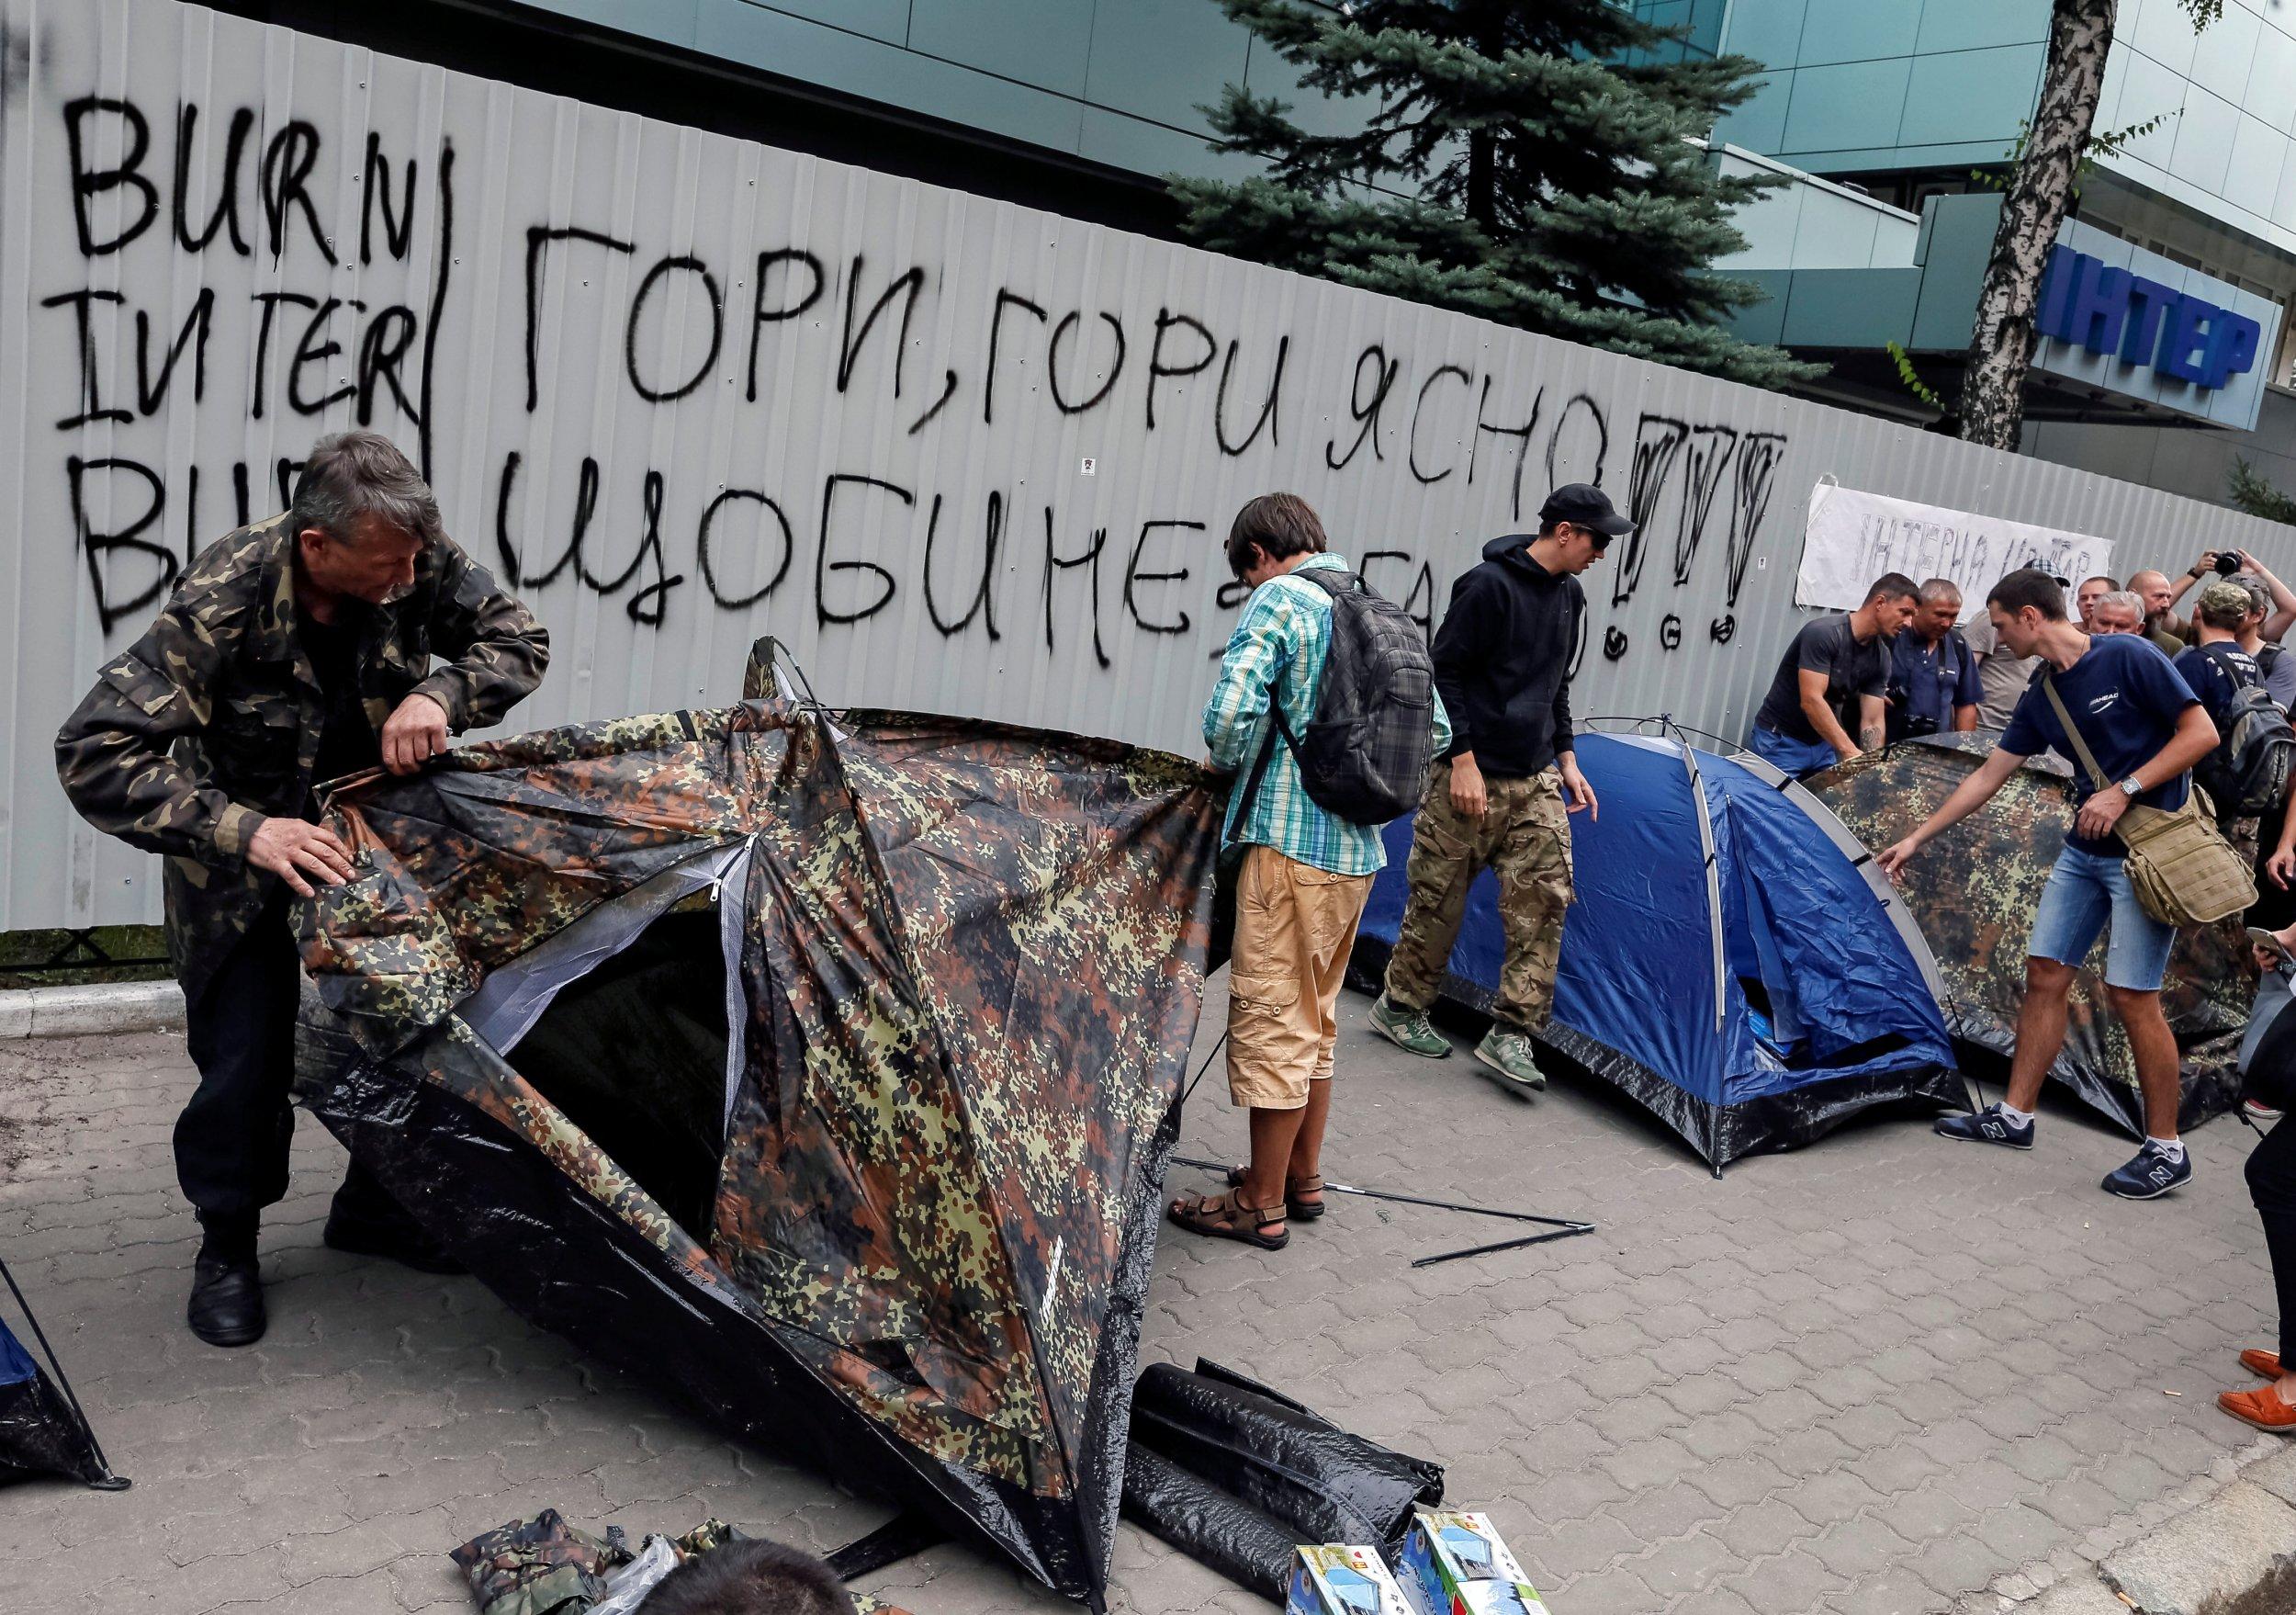 Inter TV protesters